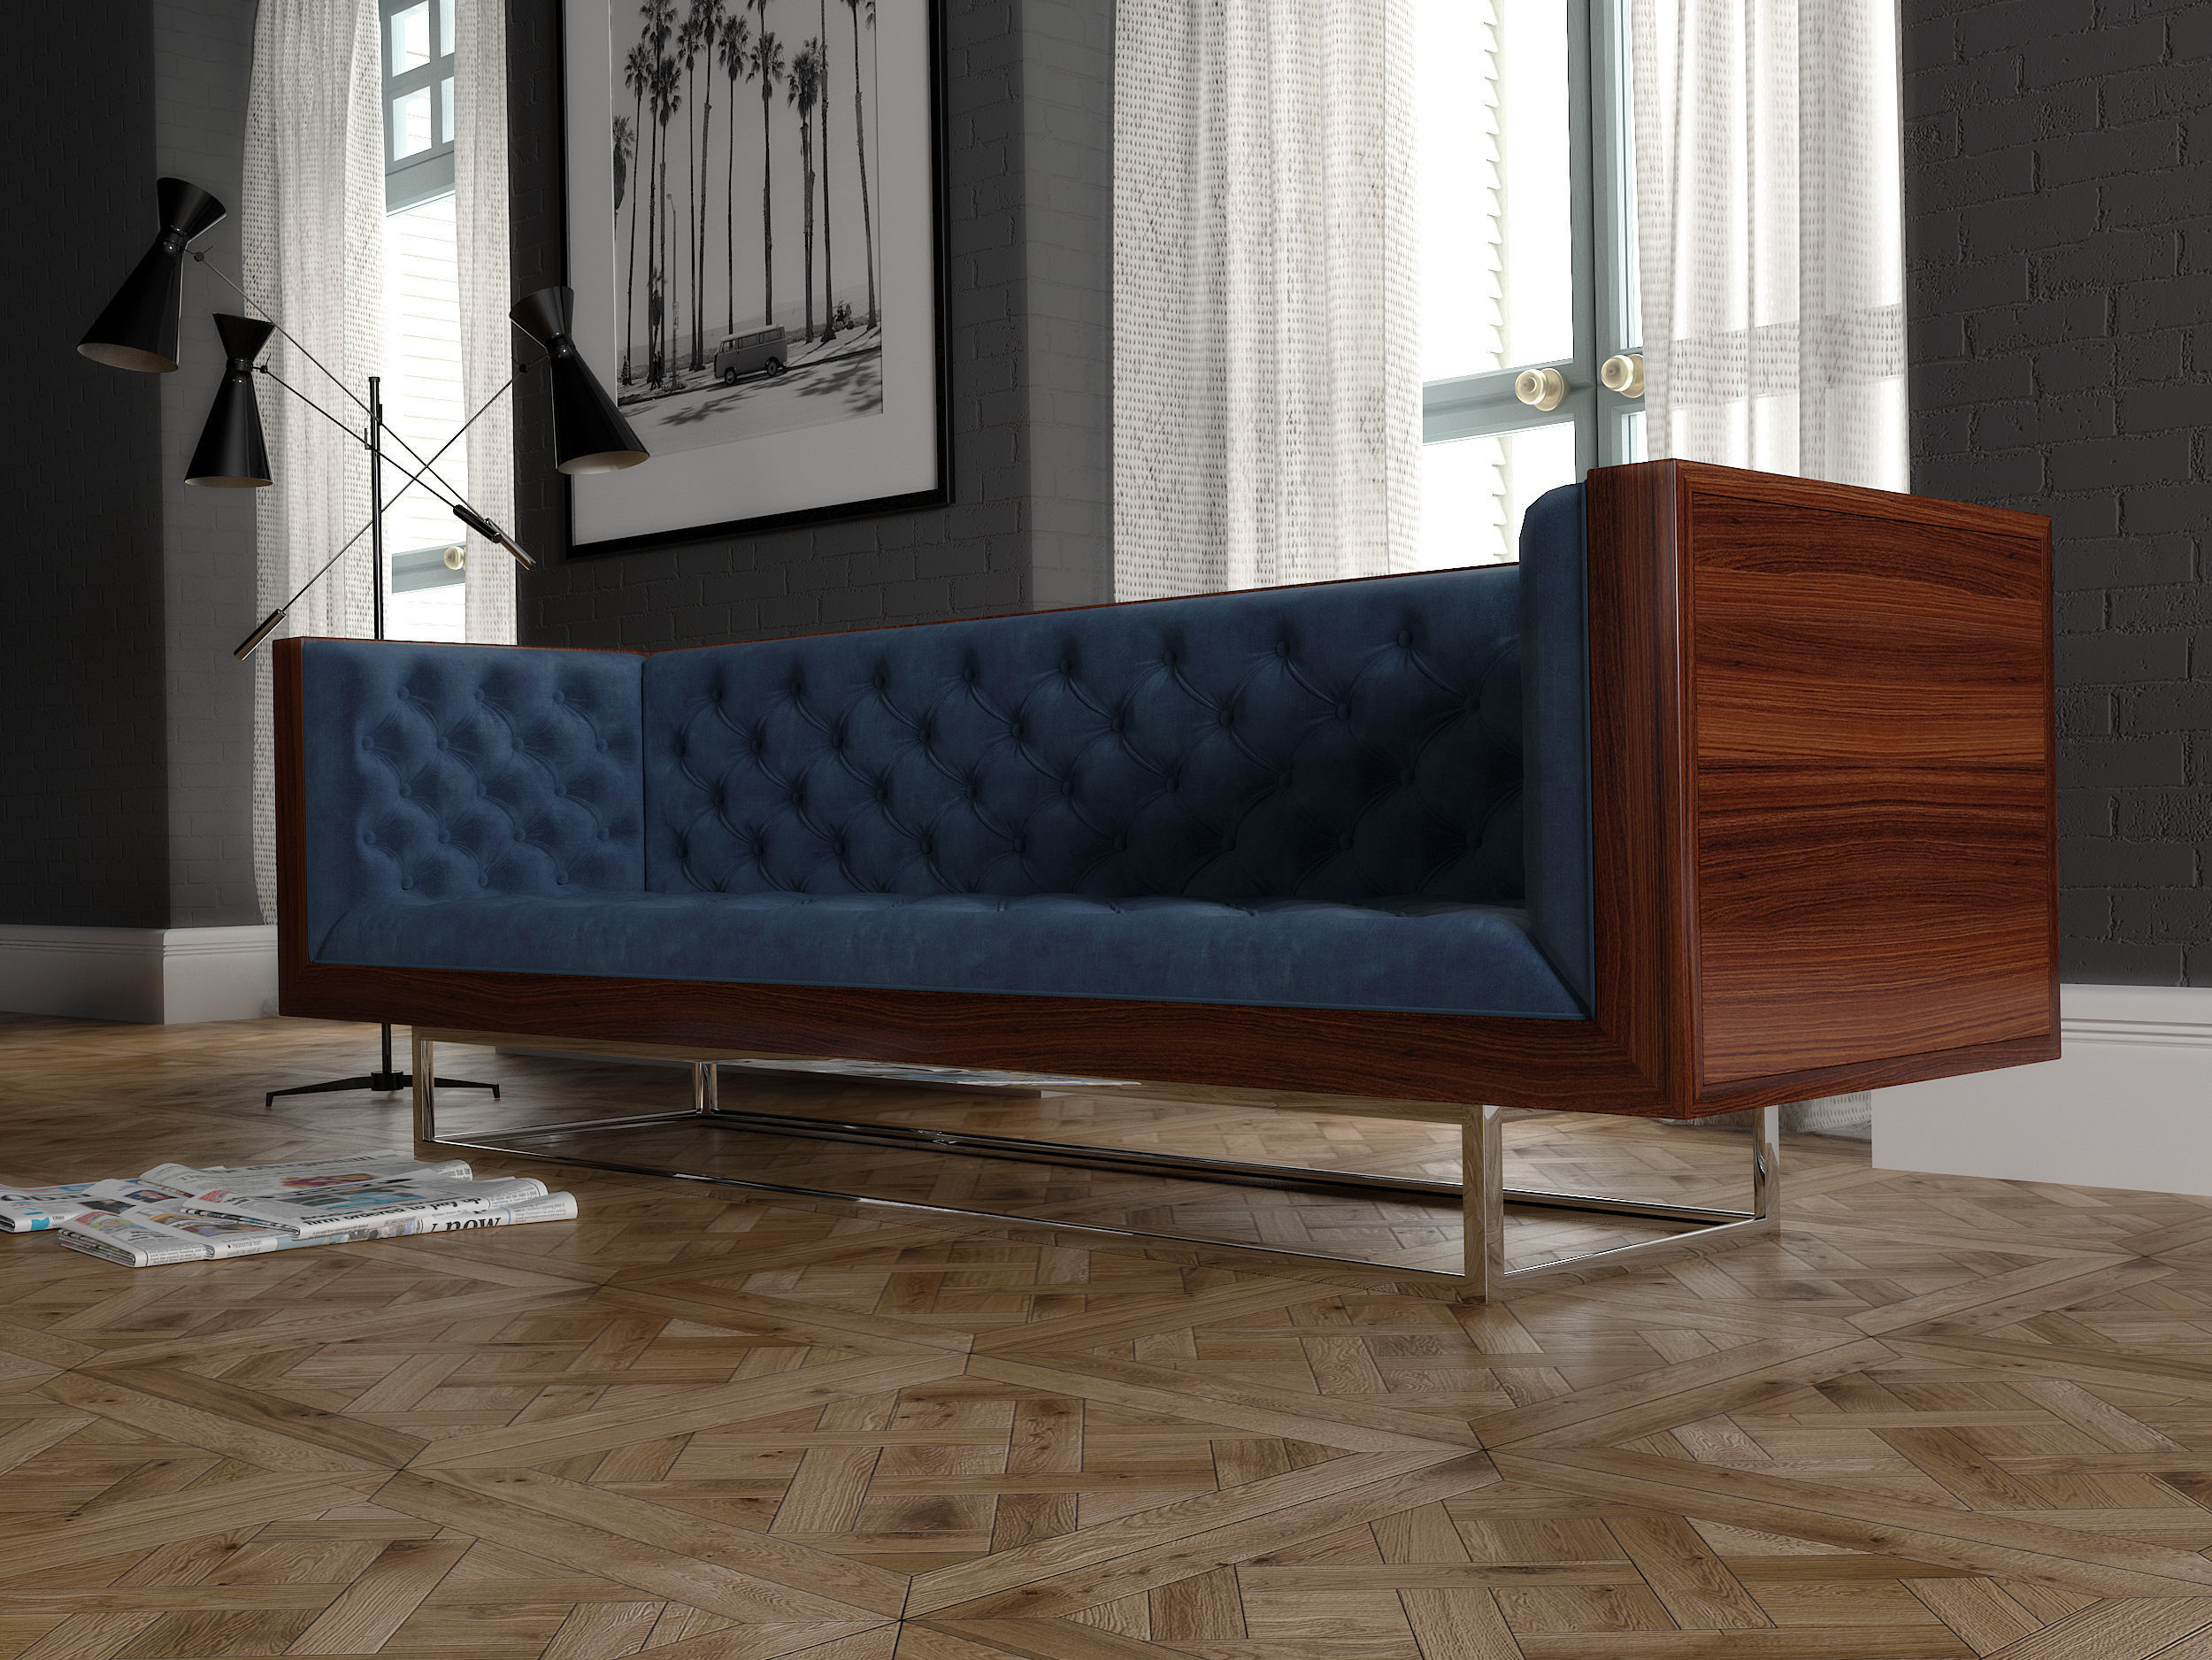 Milo Baughman velevet sofa